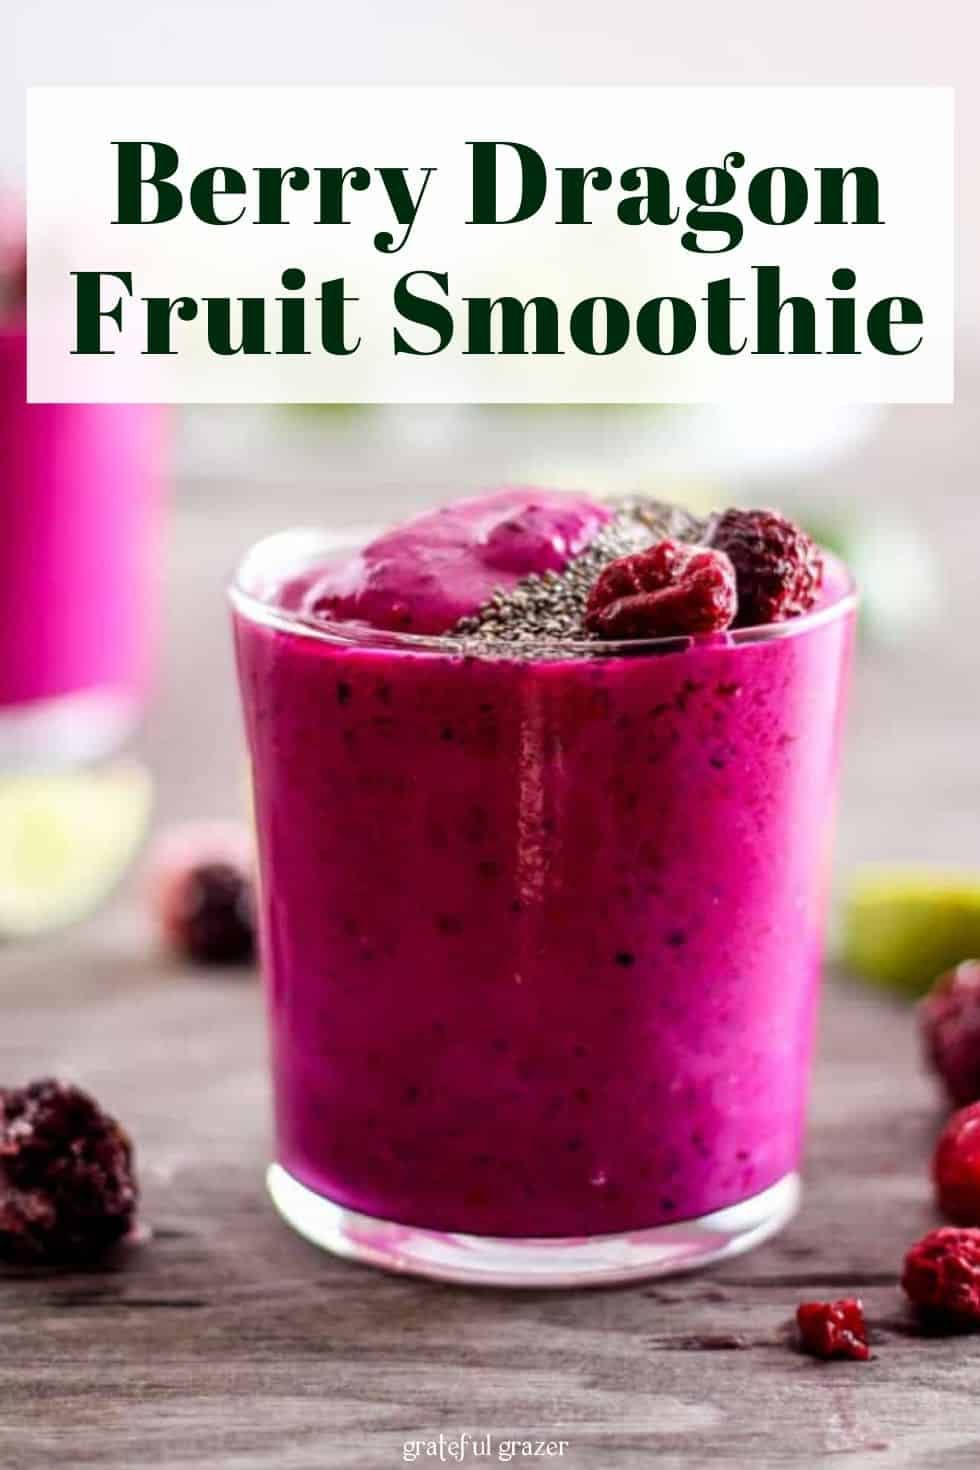 Dragon Fruit Smoothie Recipe | Healthy Berry Pitaya Drink